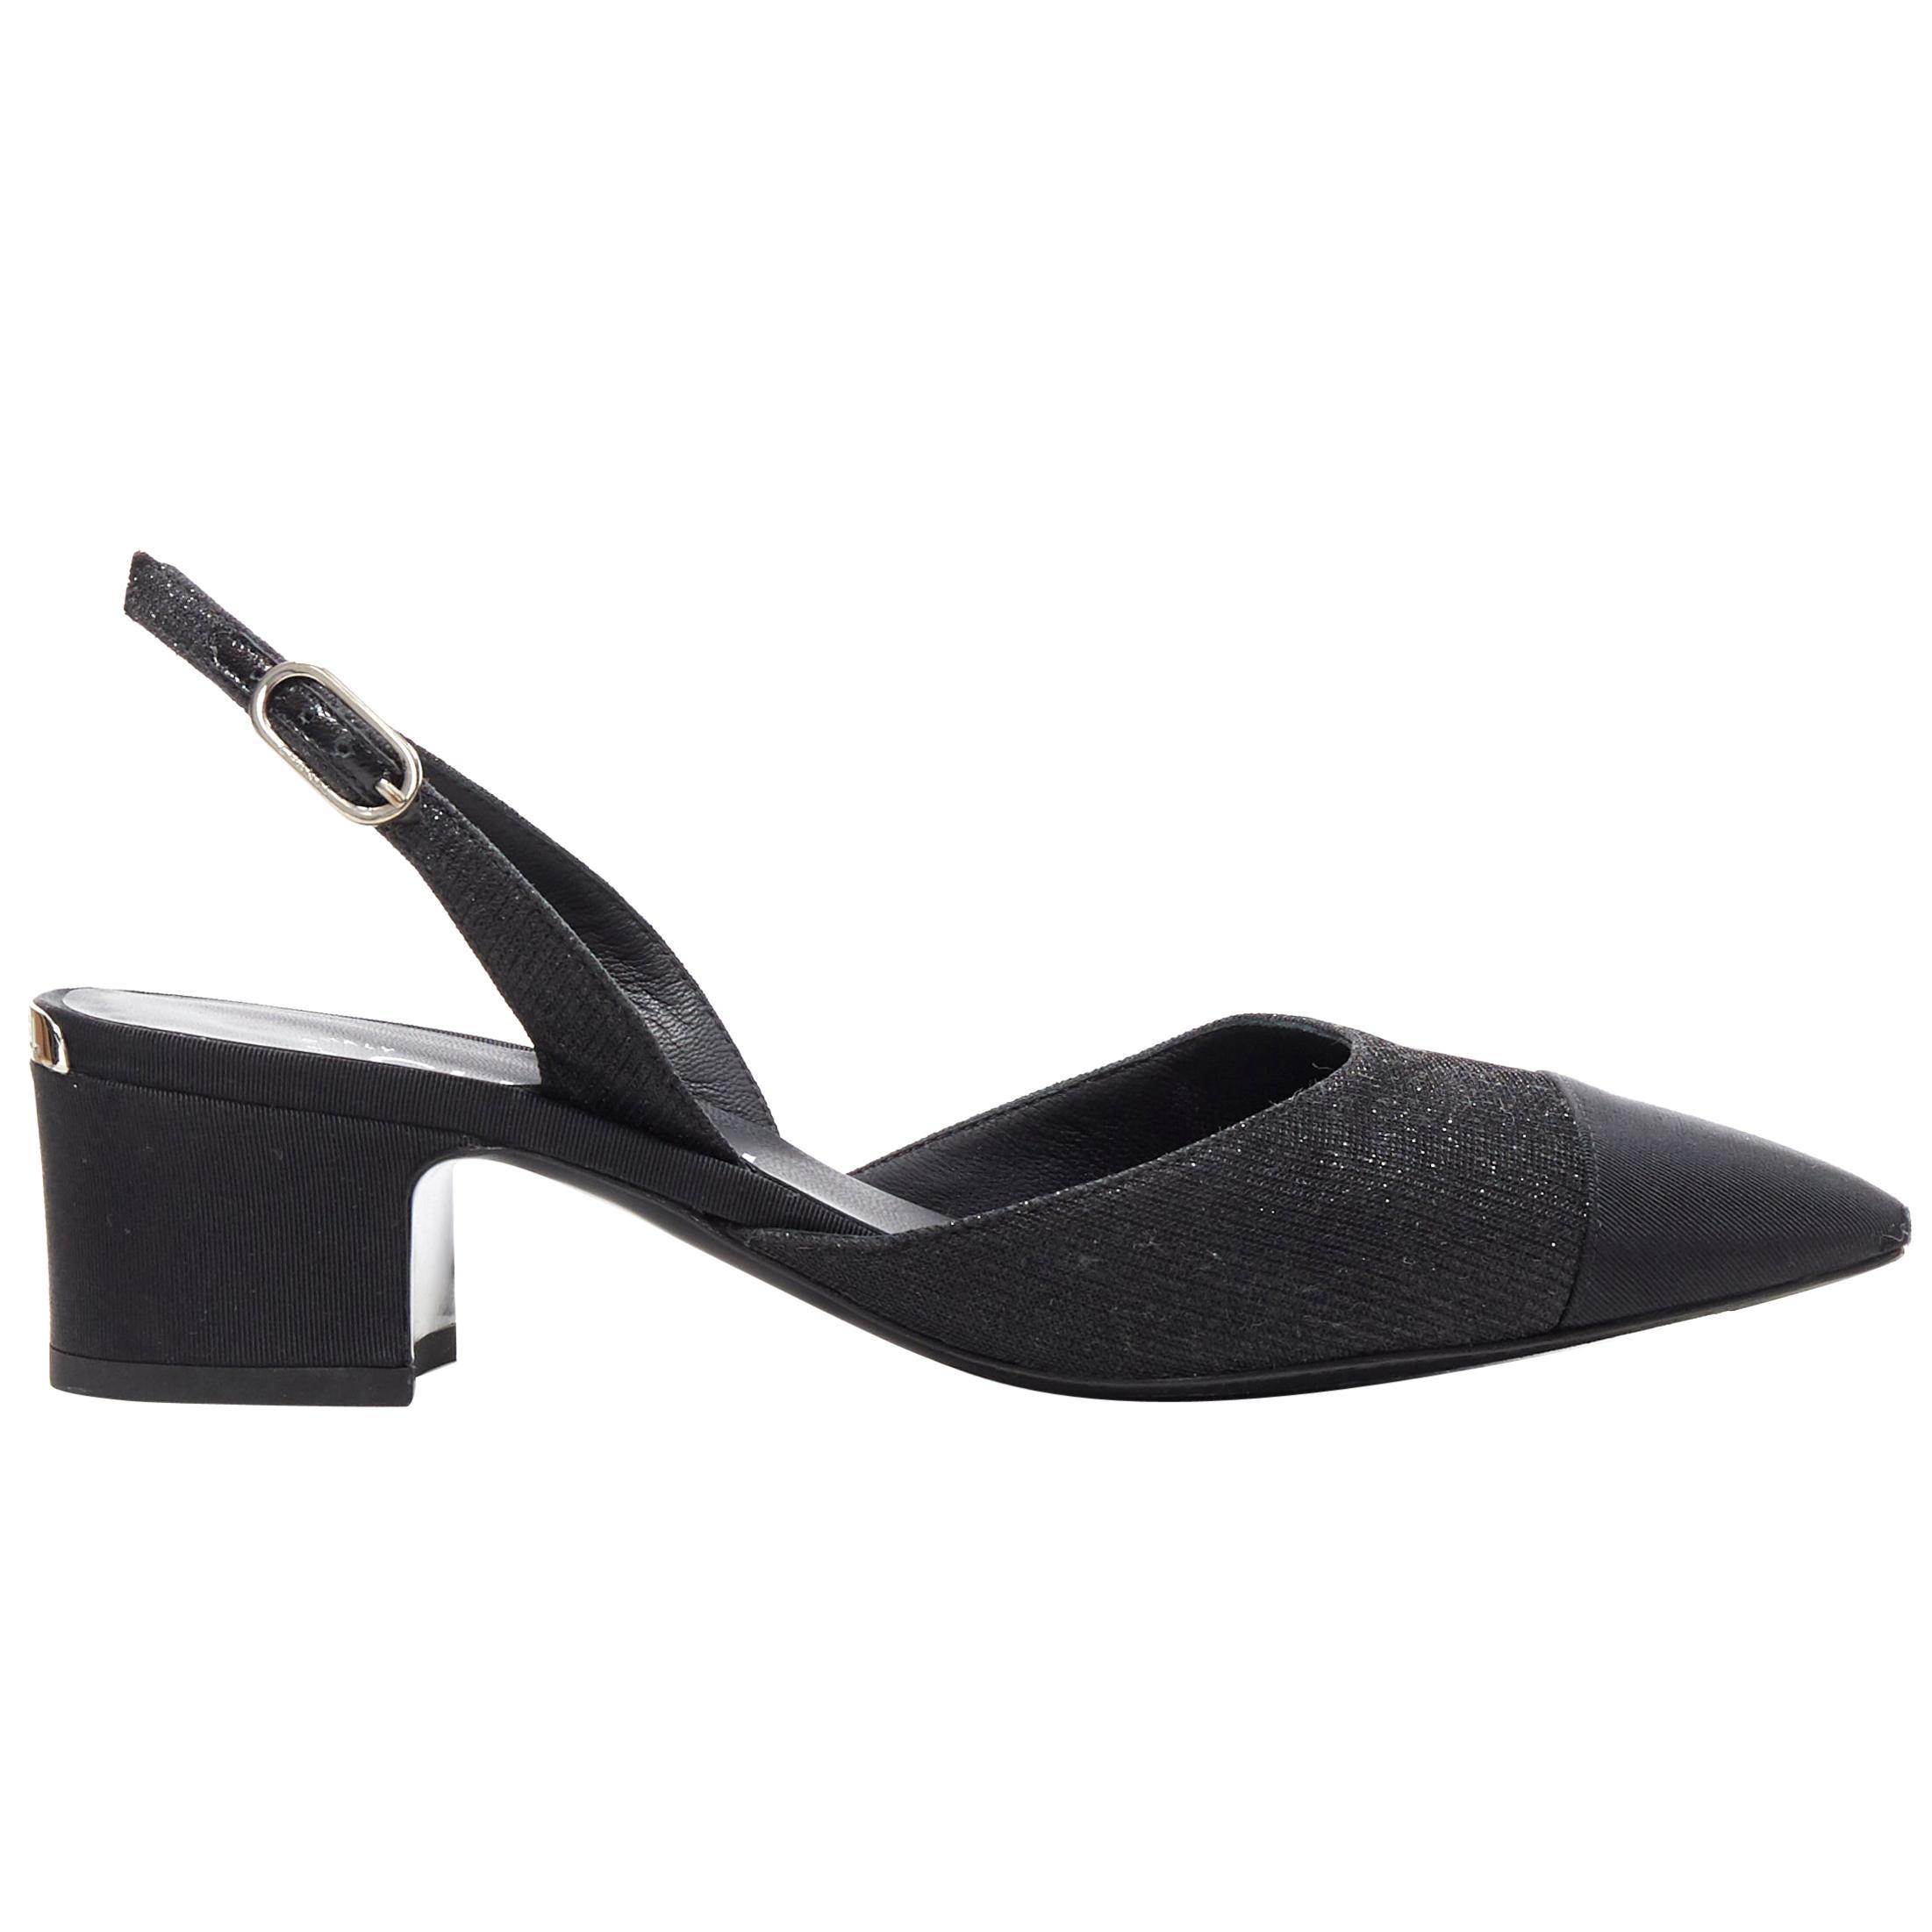 CHANEL 17B black glittery grosgrain toe cap logo chunky heel slingback pump EU36